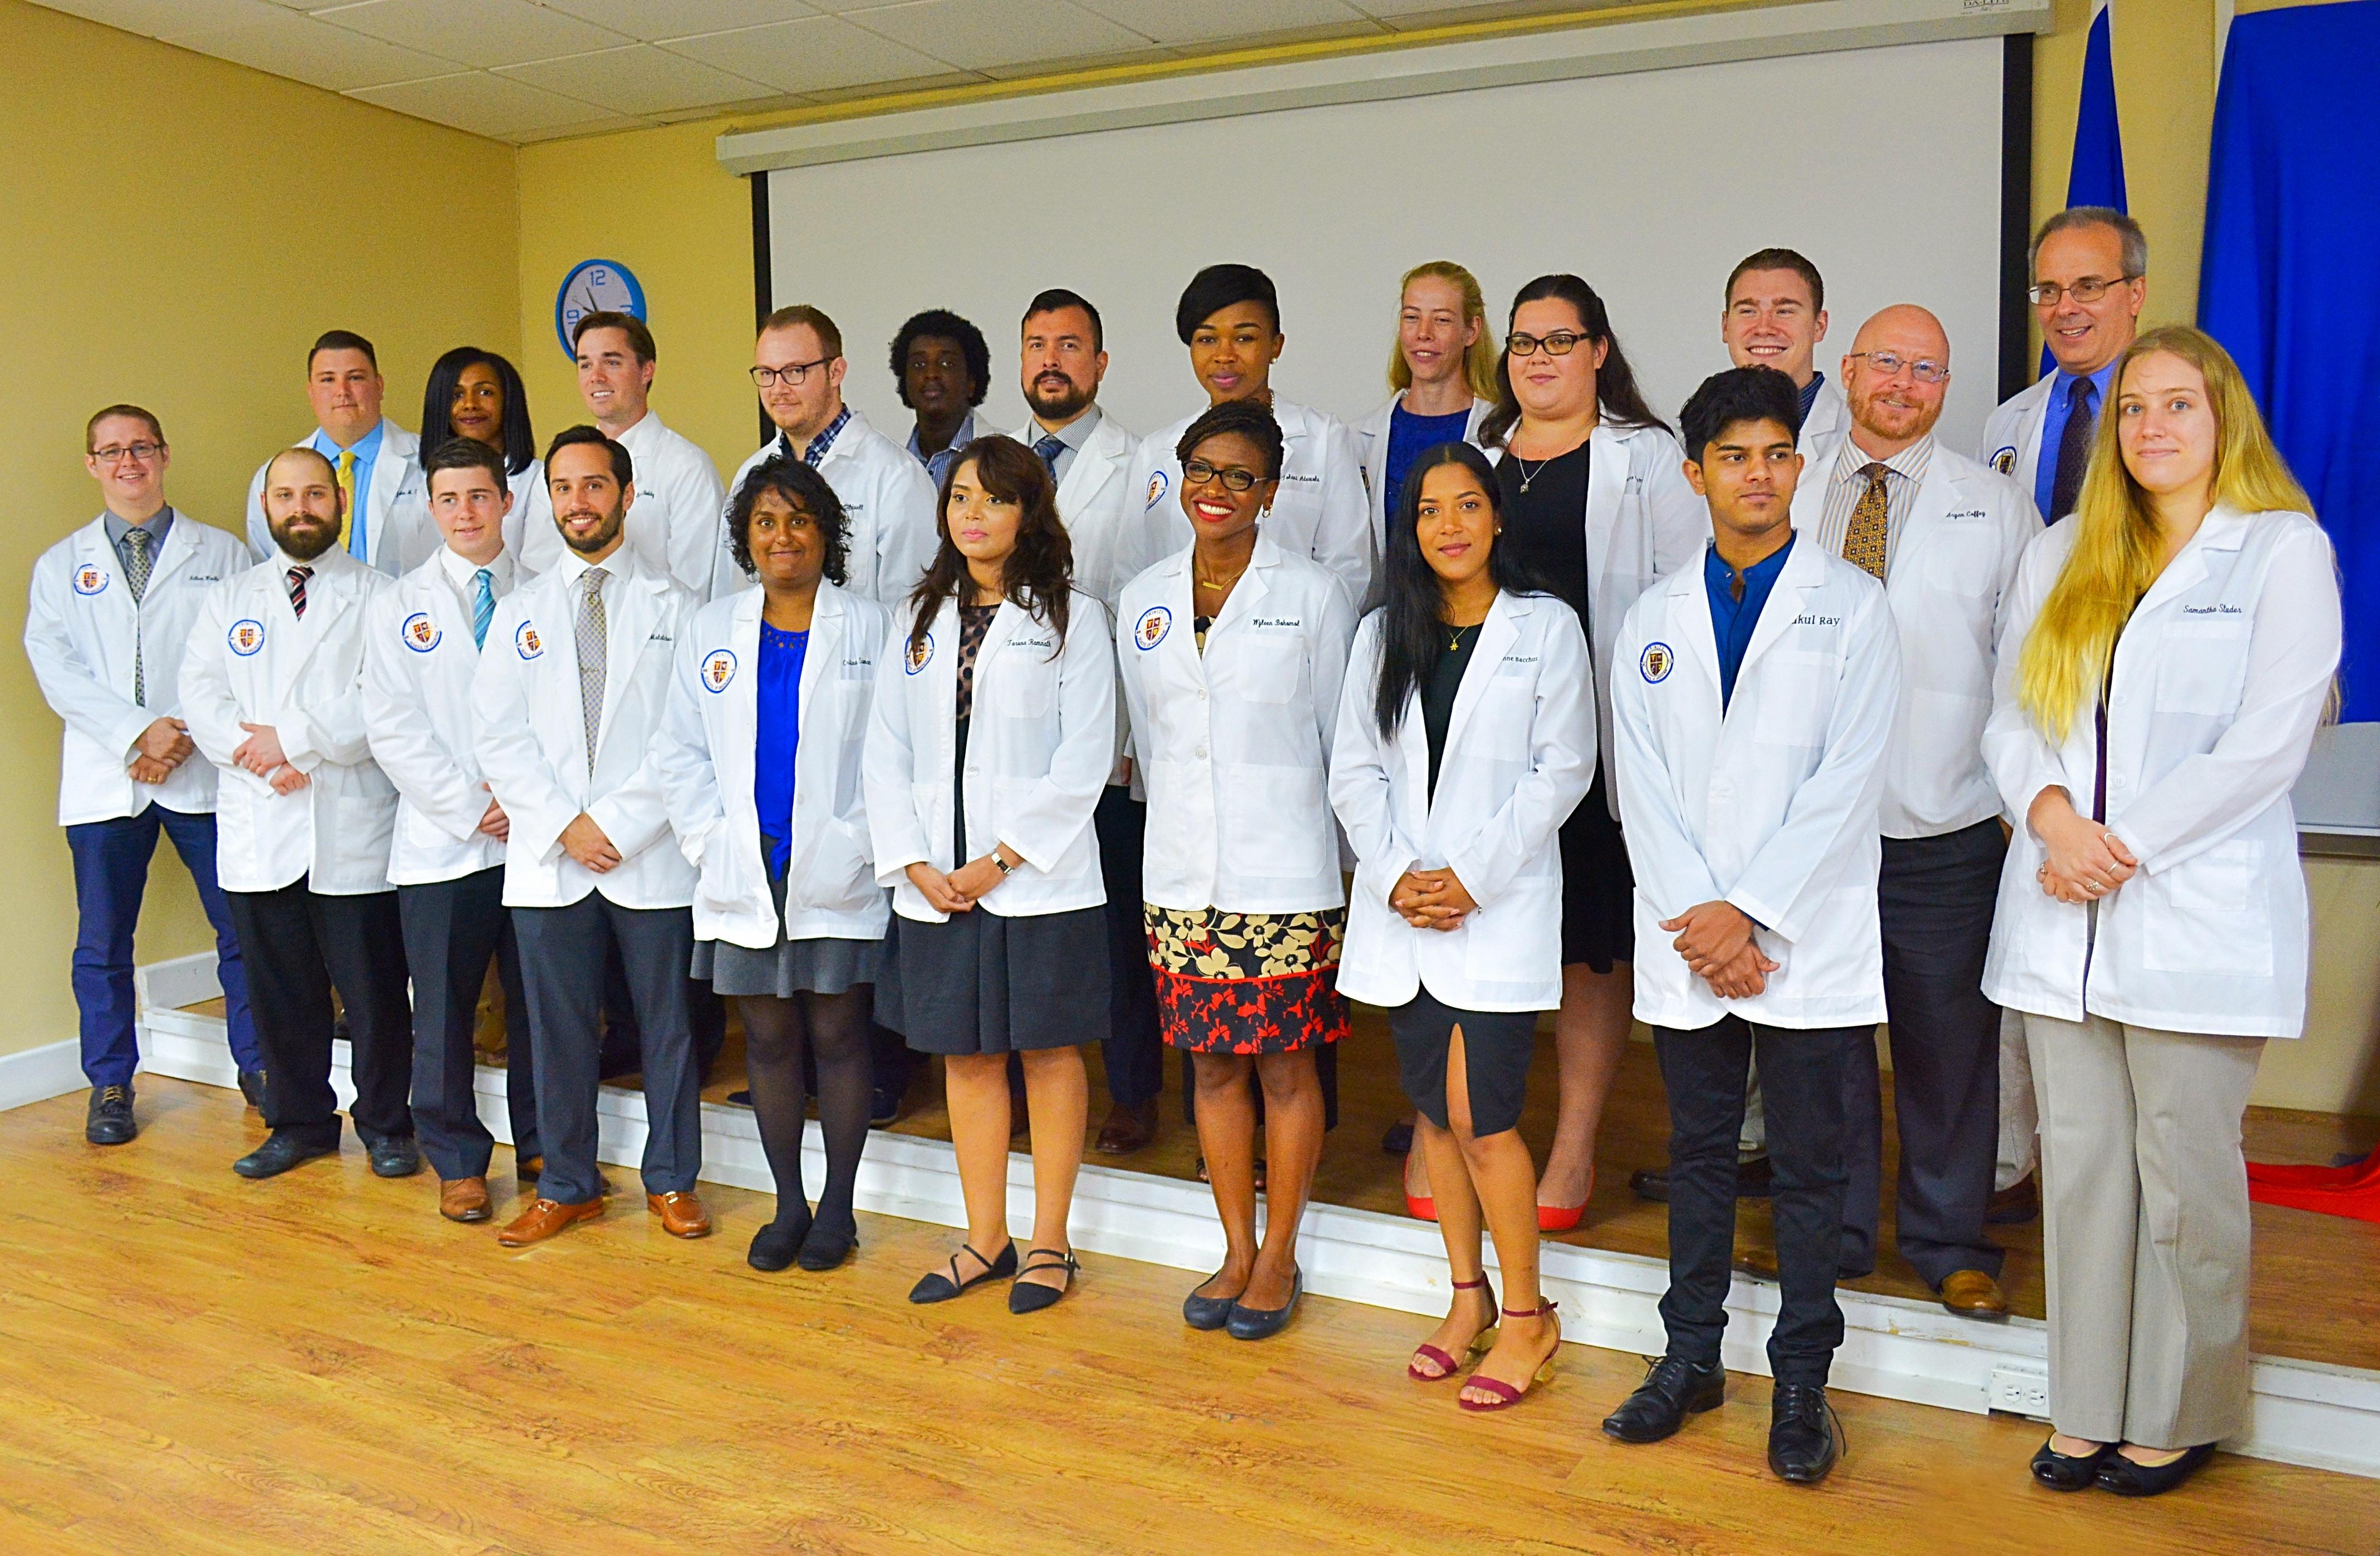 Trinity School of Medicine Holds May 2017 White Coat Ceremony